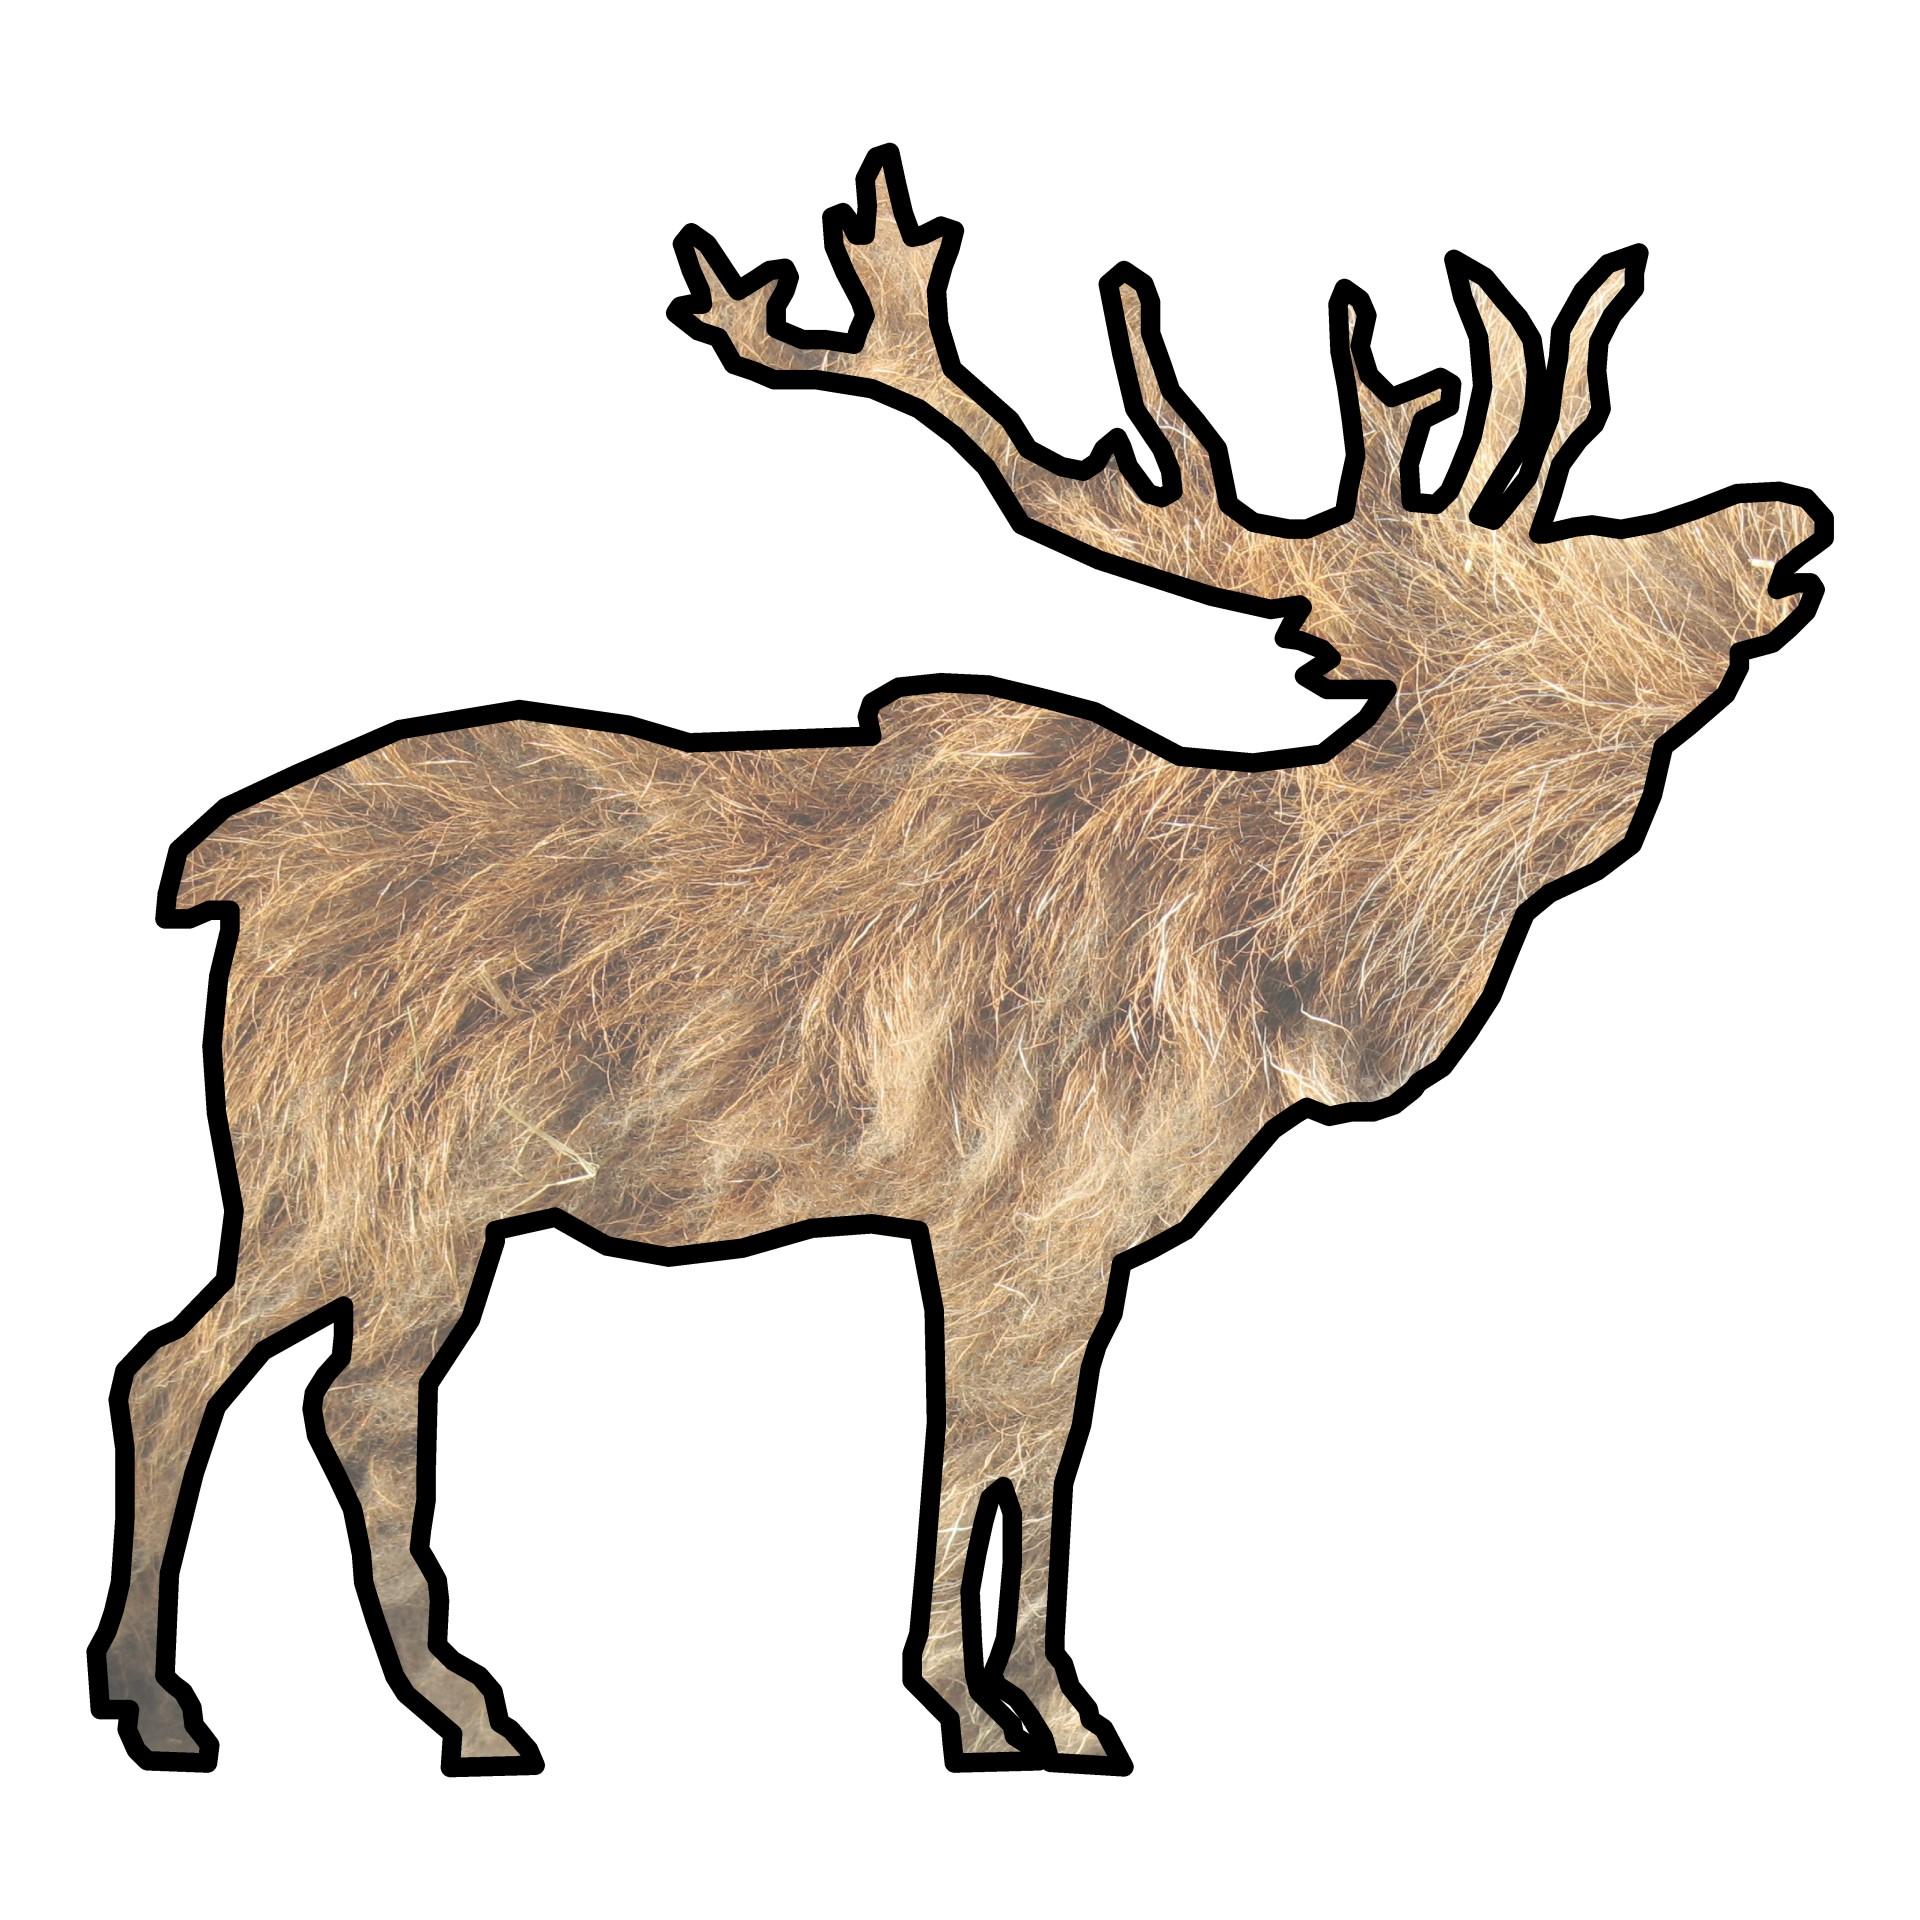 1920x1920 Elk Silhouette